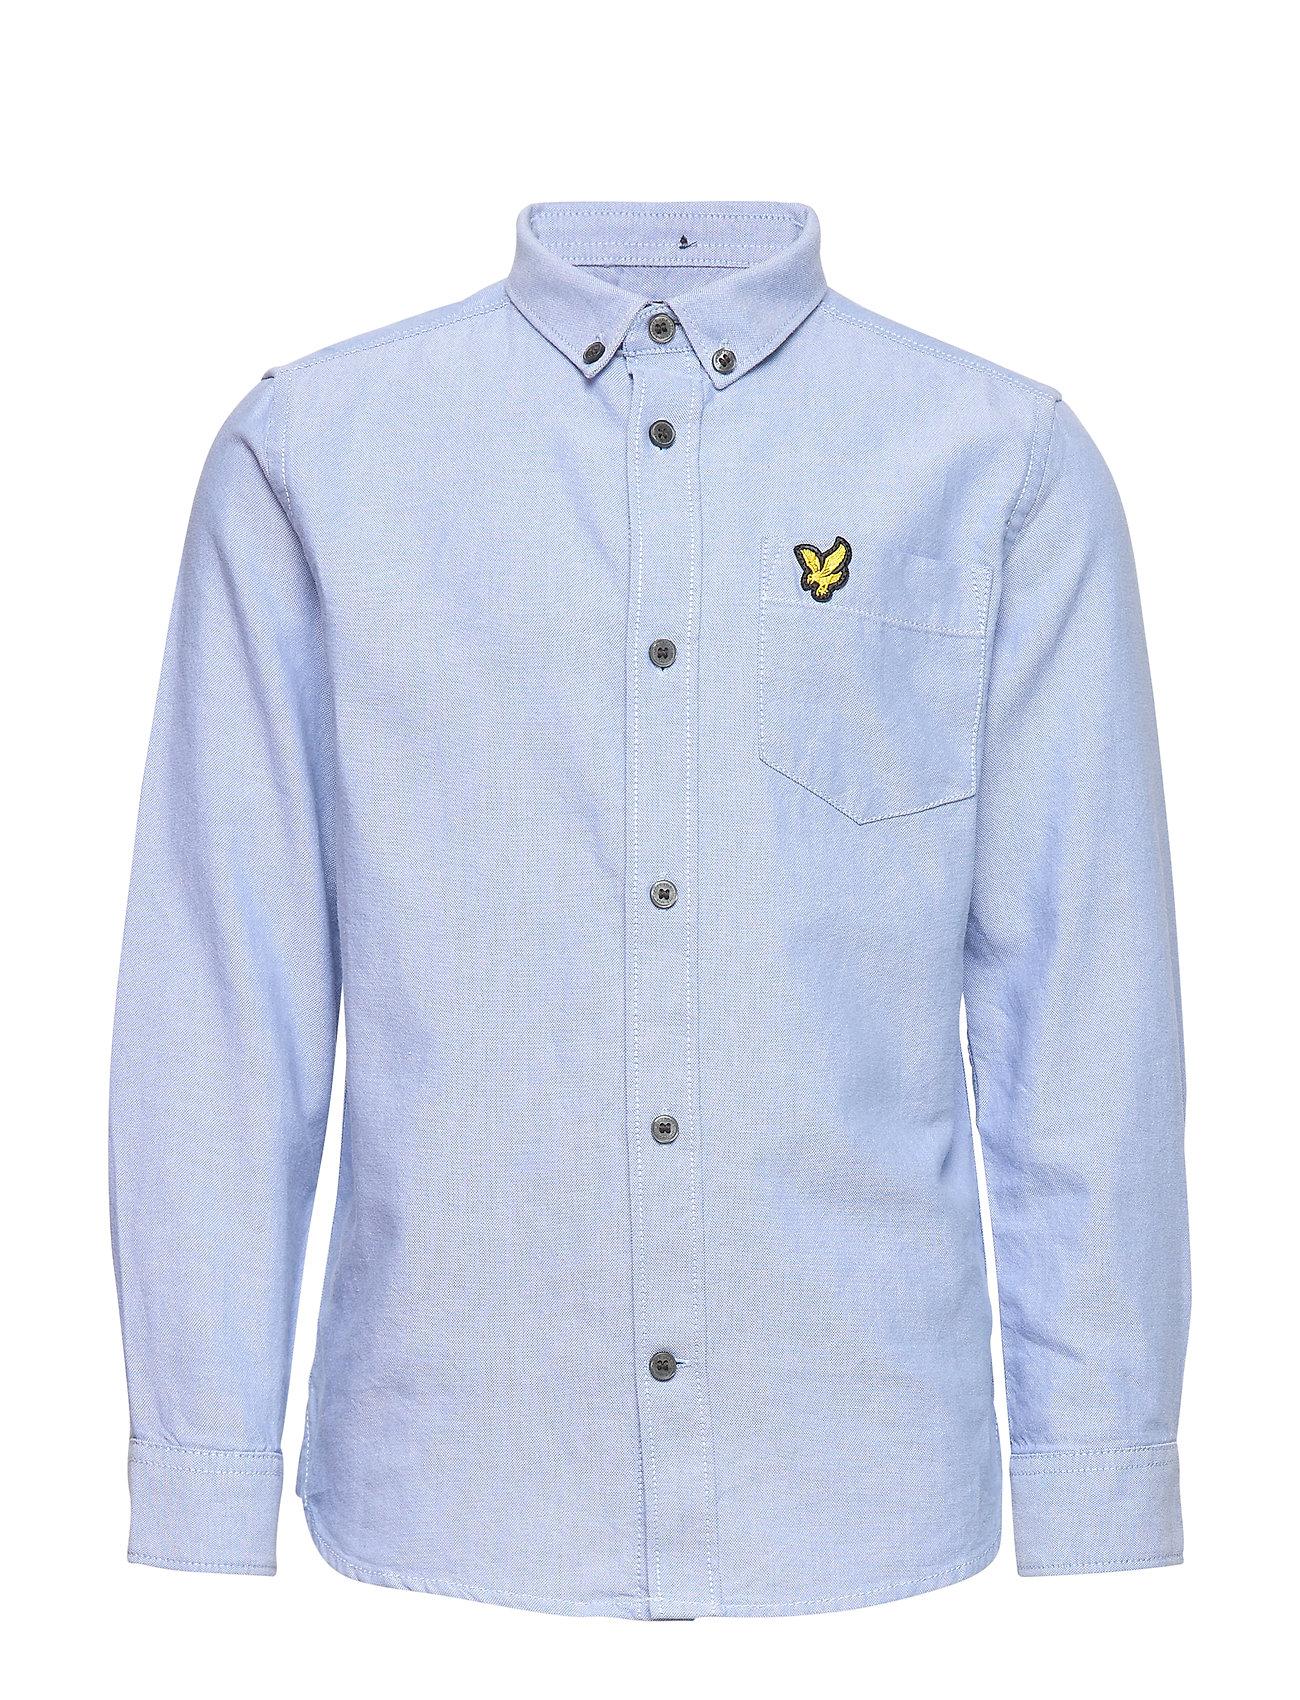 Lyle & Scott Junior Oxford Shirt LS - SKY BLUE